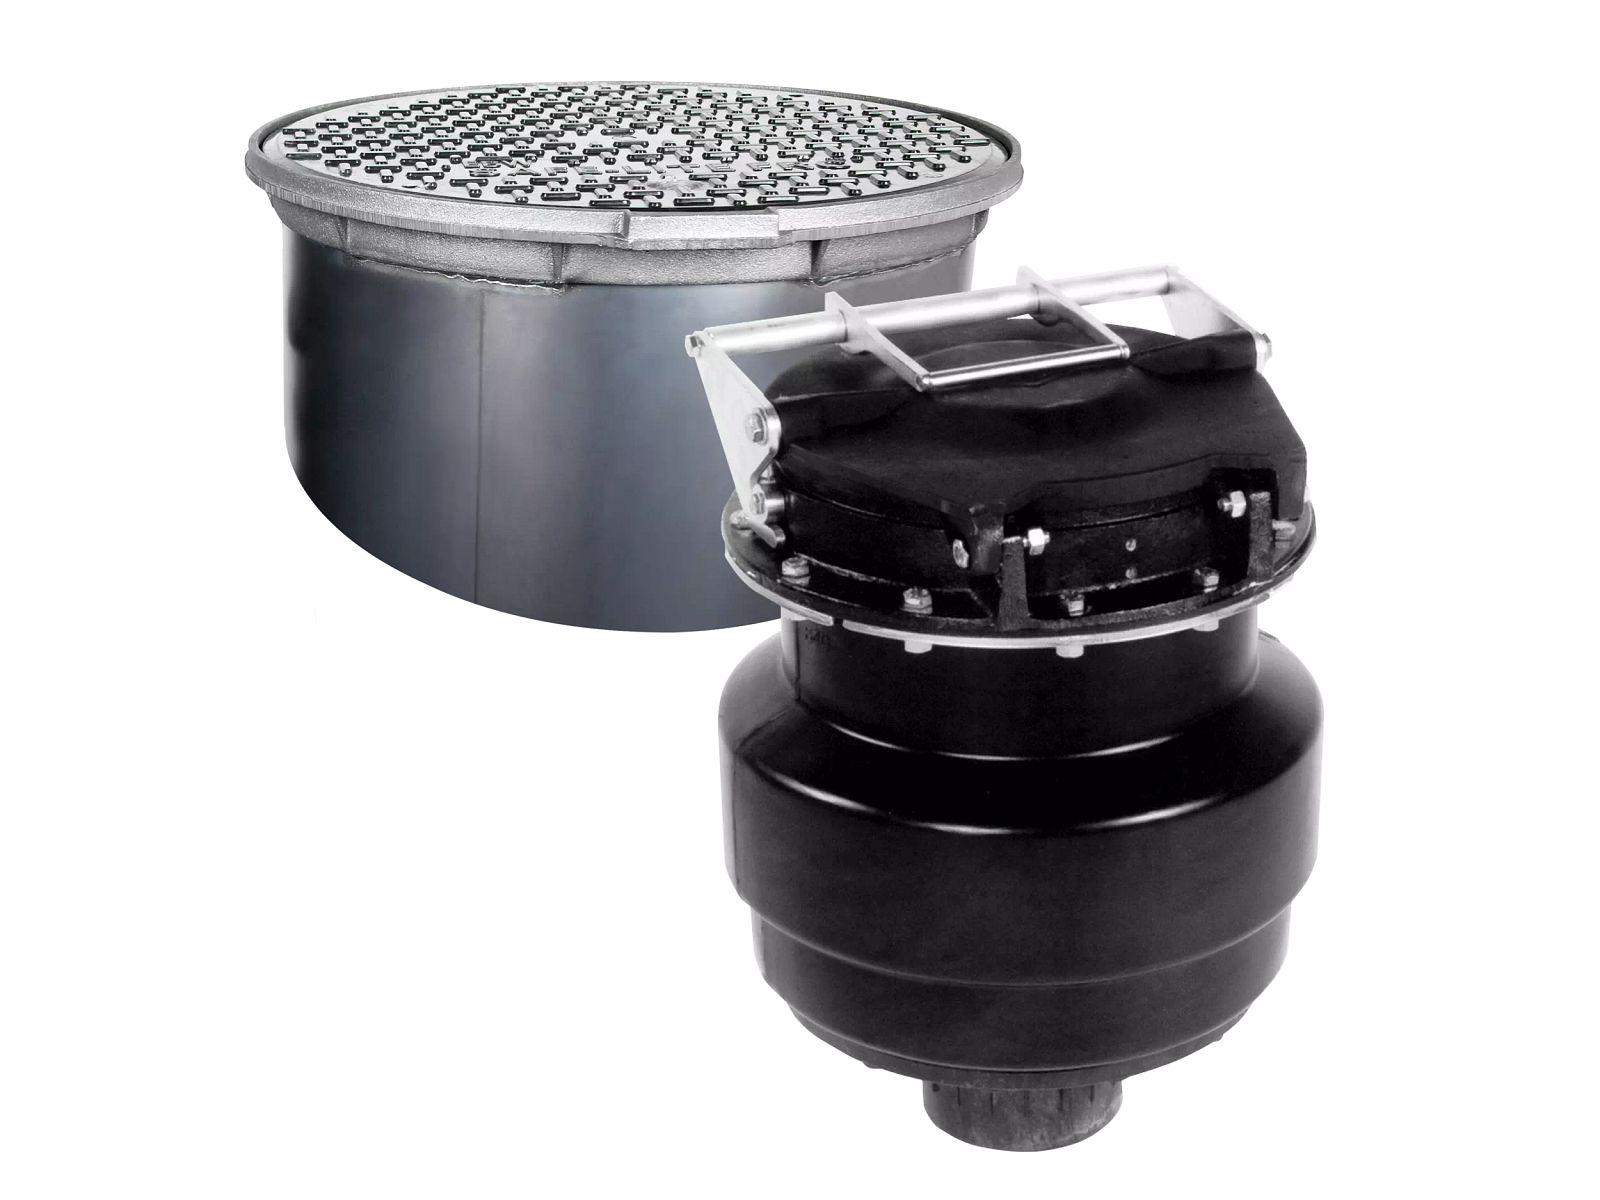 EBW Below Grade Spill Container - feature.psd